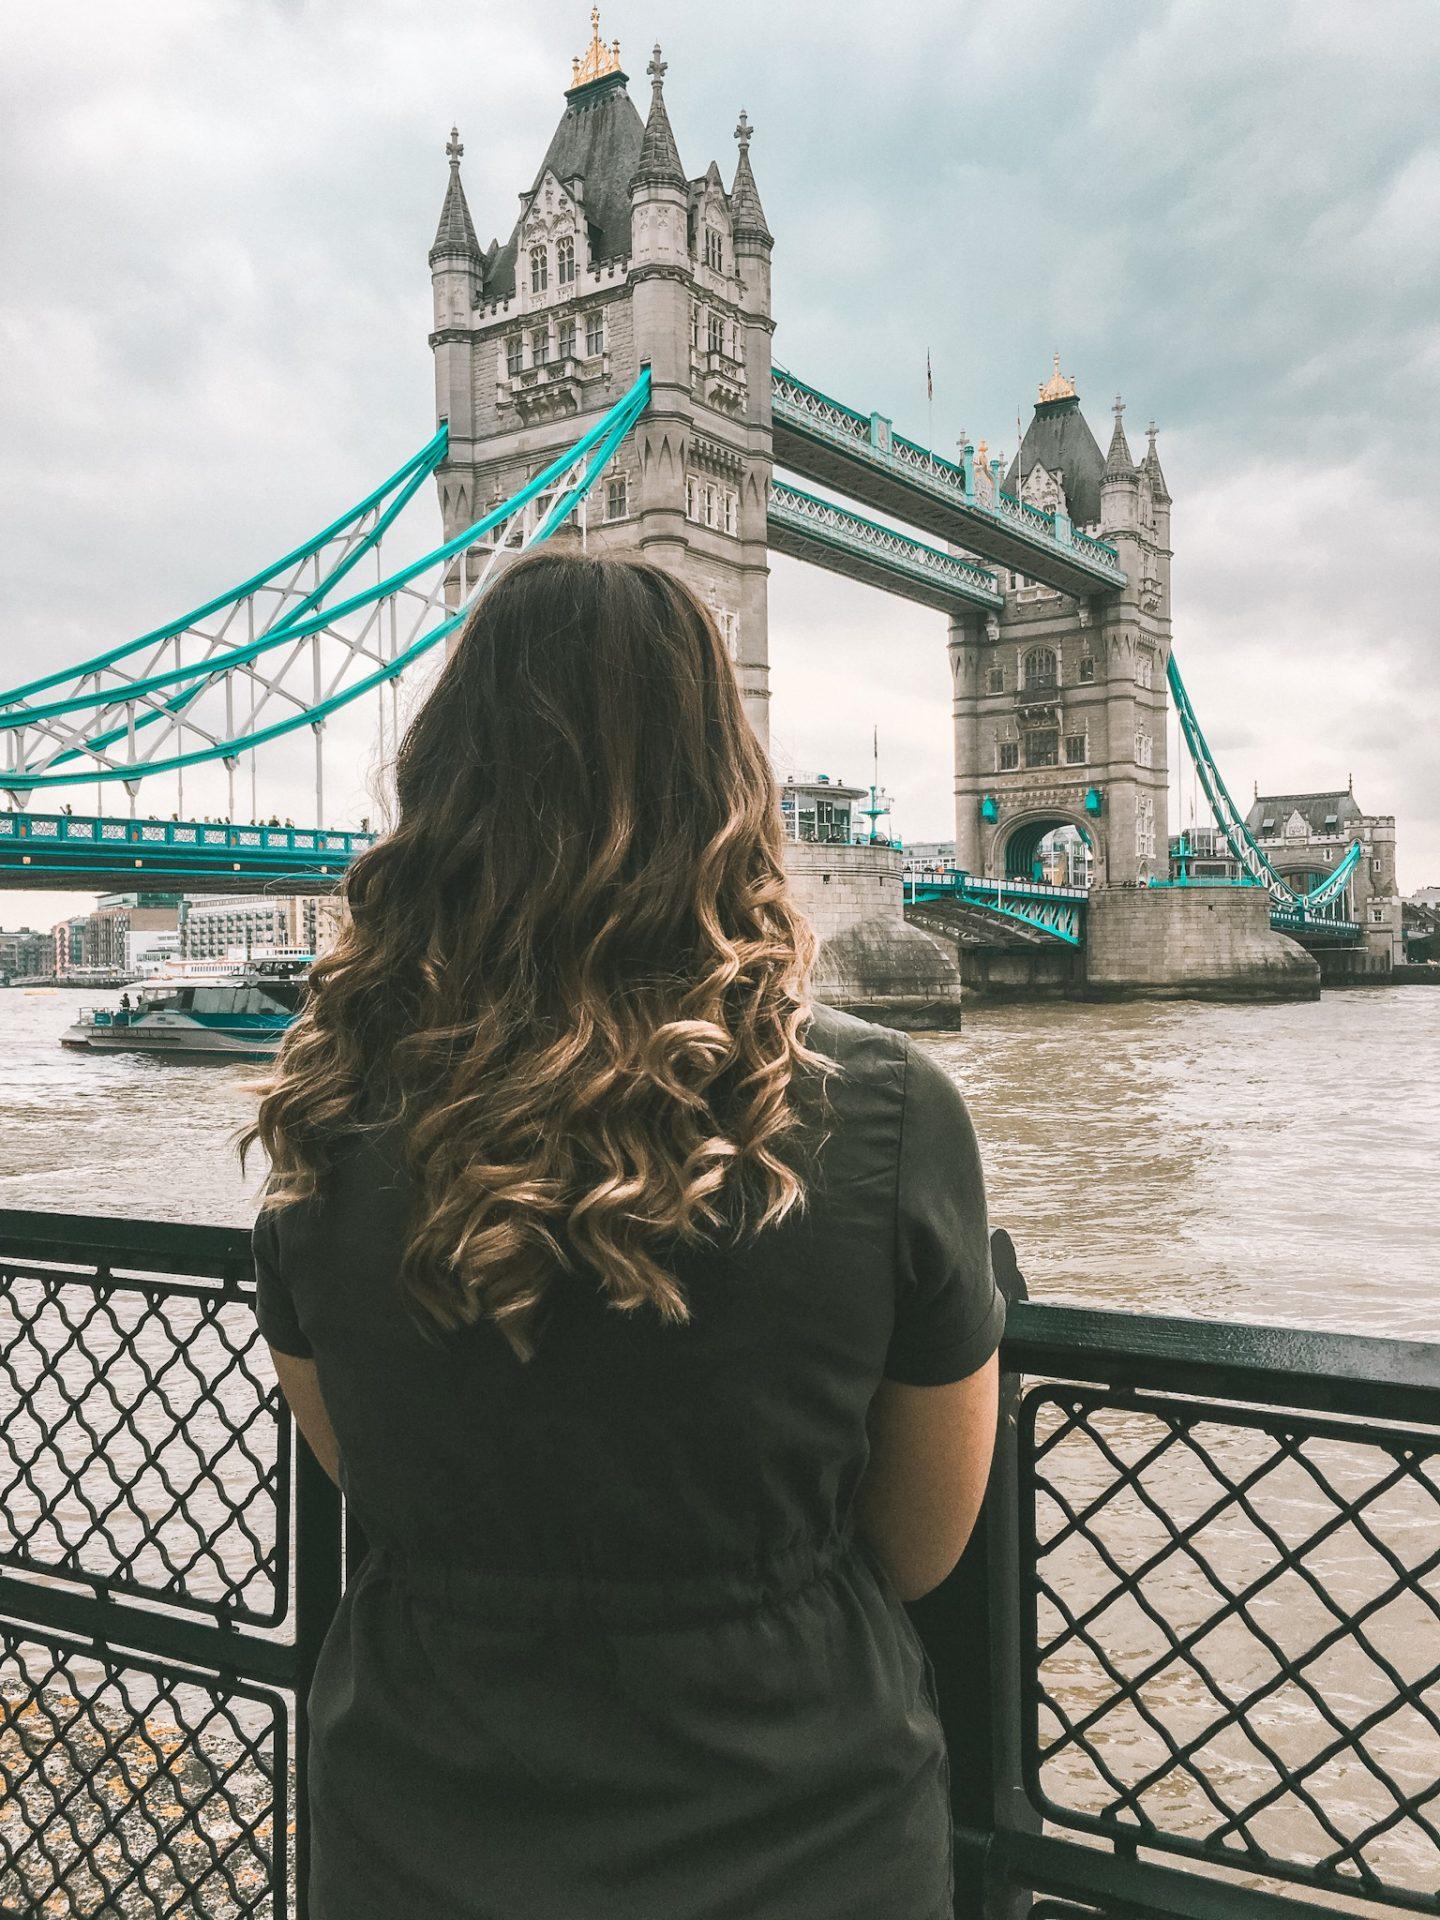 Views of London Bridge - two days in London